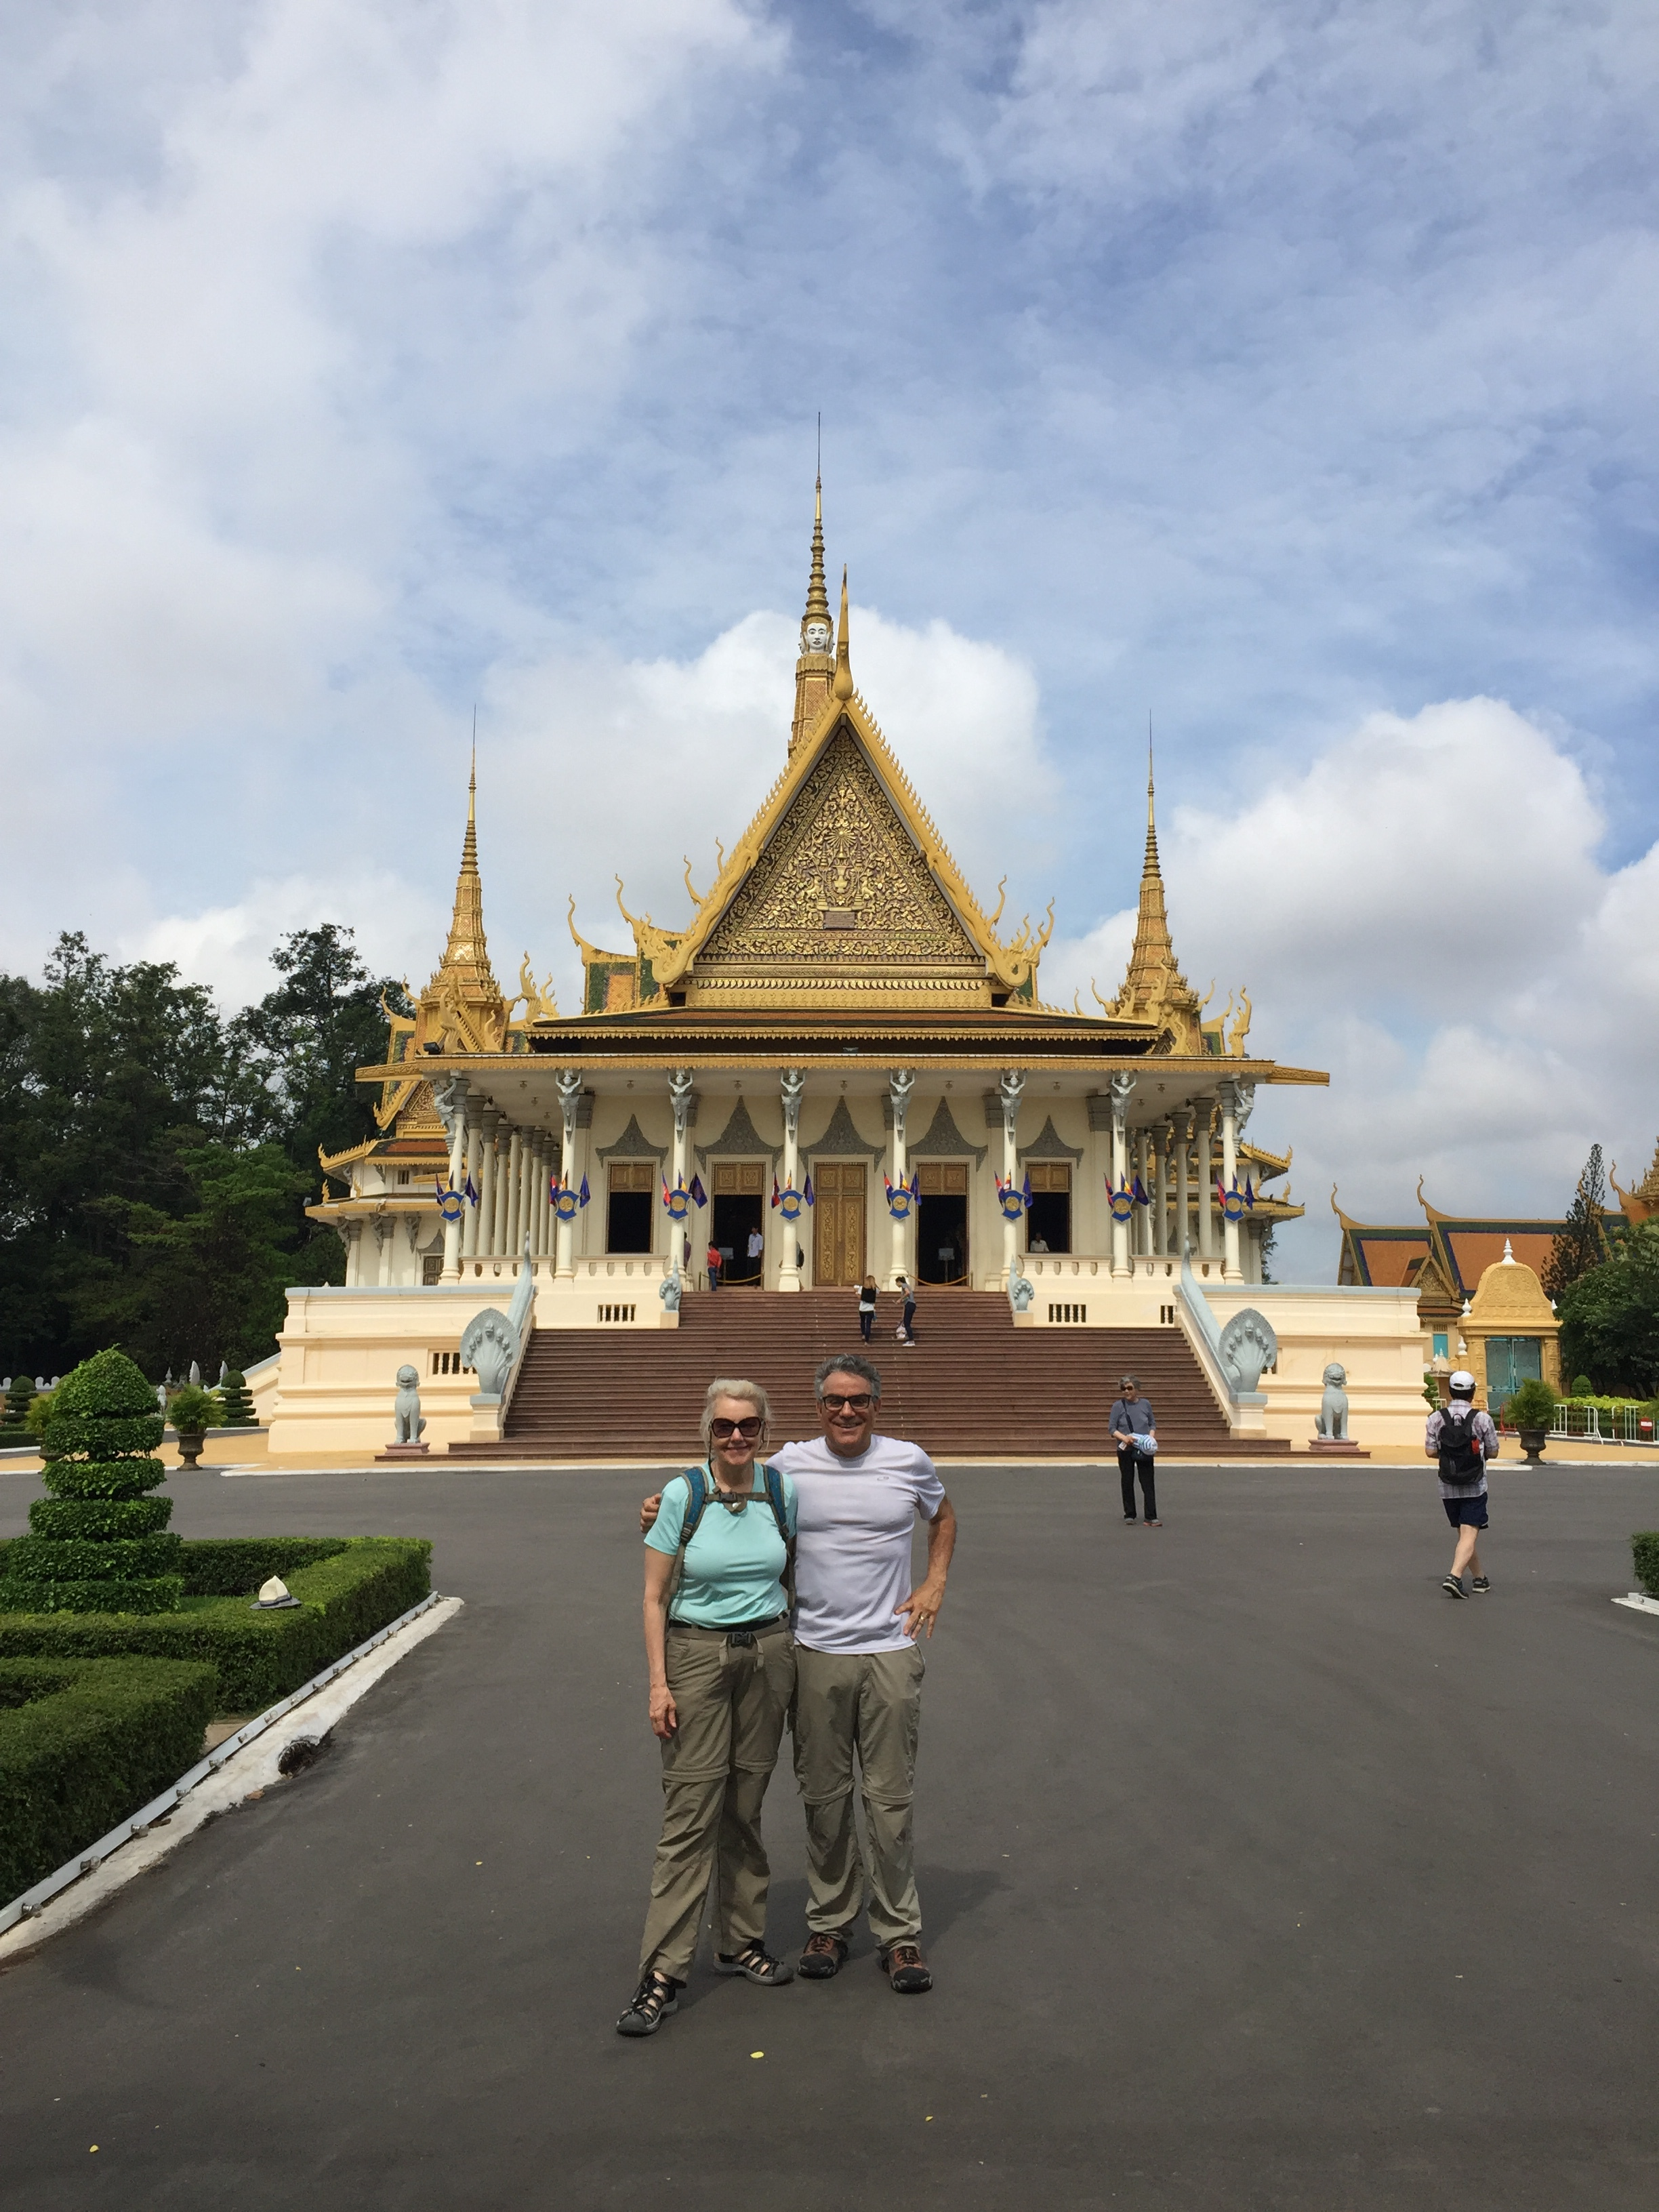 The main palace